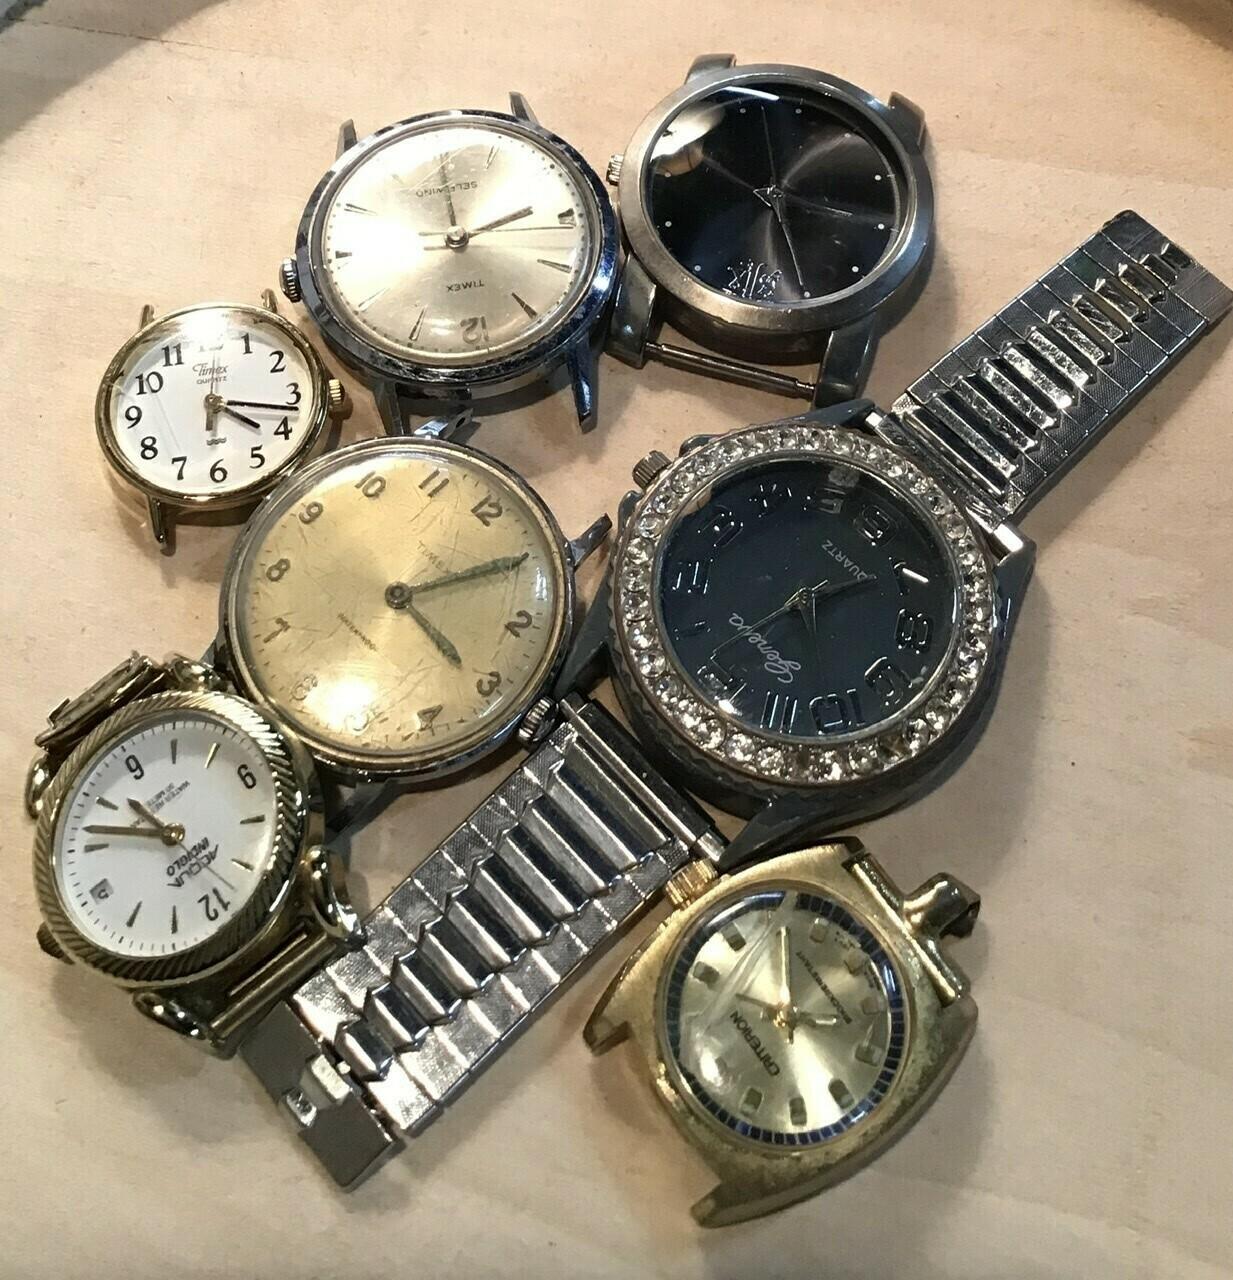 Watch Parts/Gears/Vintage #10